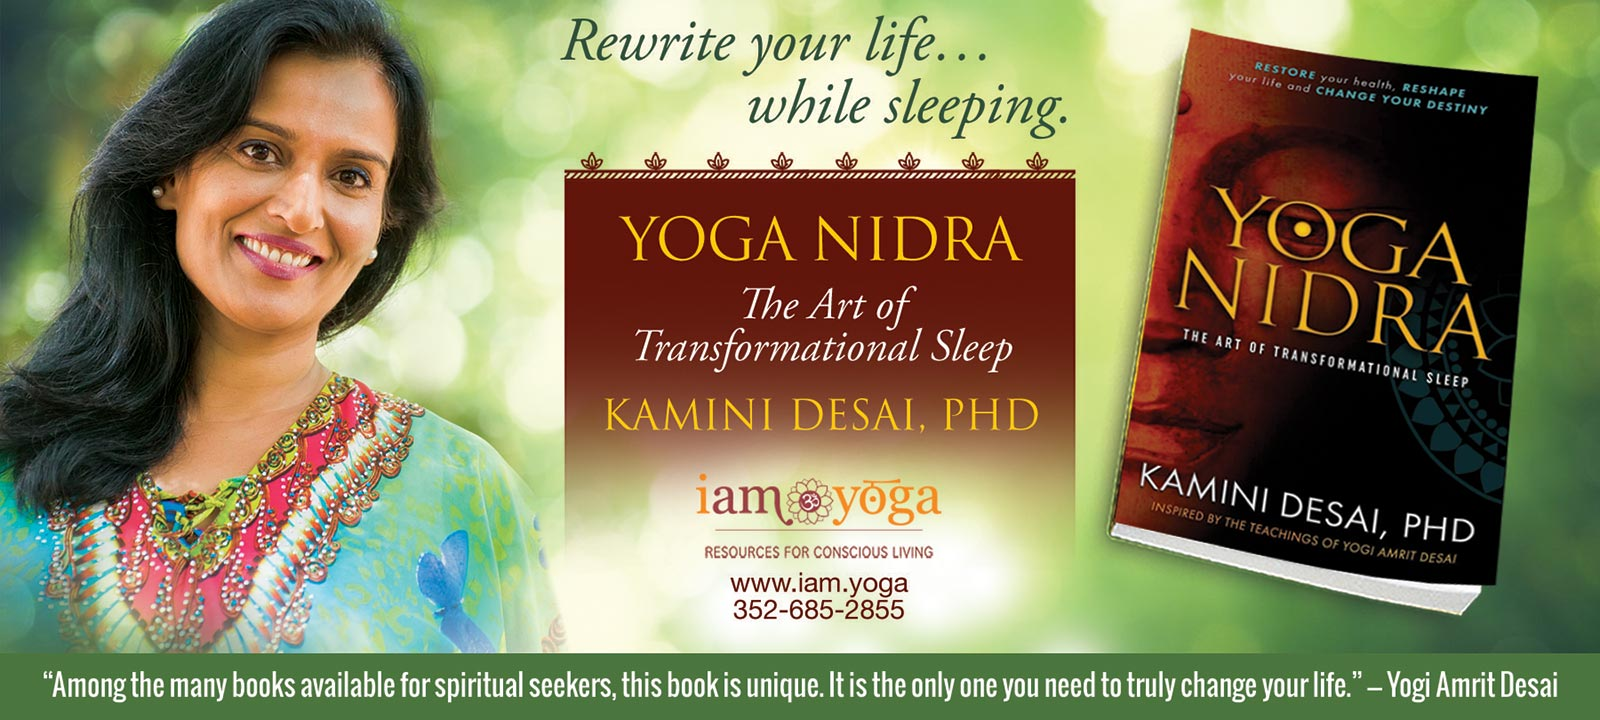 The Art of Transformational Sleep - Kamini Desai, Ph.D.